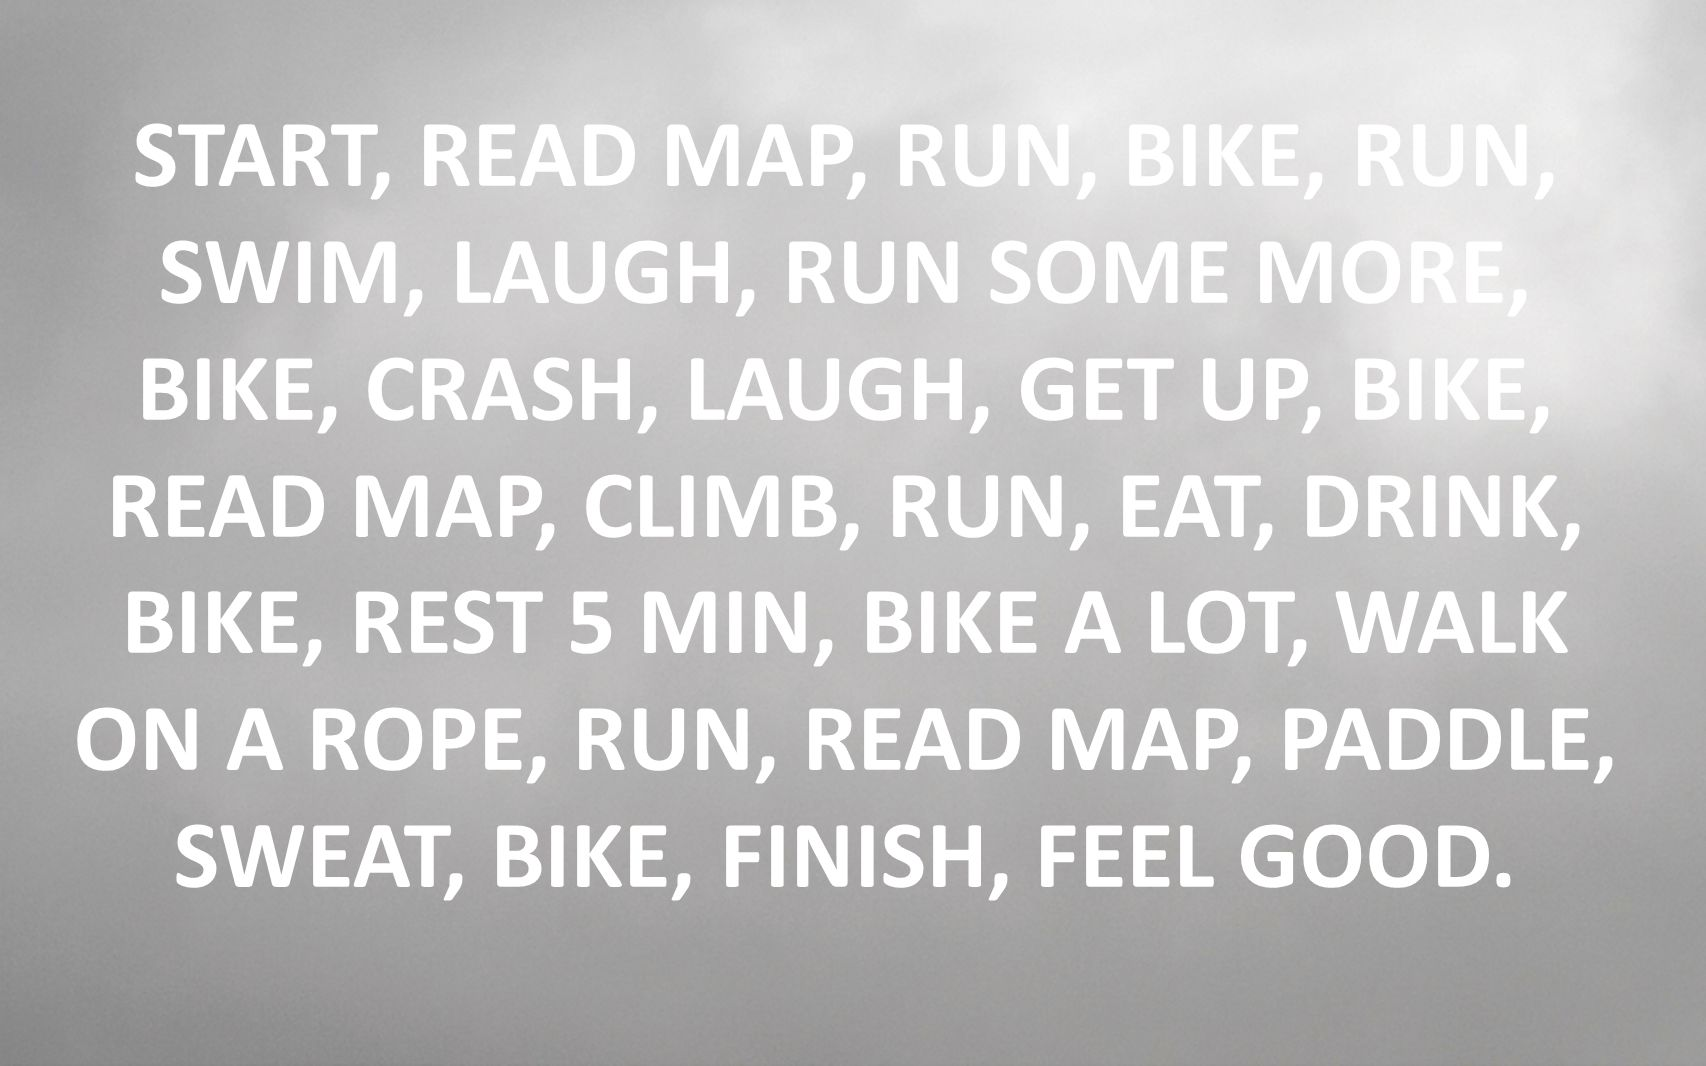 START, READ MAP, RUN, BIKE, RUN, SWIM, LAUGH, RUN SOME MORE, BIKE, CRASH, LAUGH, GET UP, BIKE, READ MAP, CLIMB, RUN, EAT, DRINK, BIKE, REST 5 MIN, BIKE A LOT, WALK ON A ROPE, RUN, READ MAP, PADDLE, SWEAT, BIKE, FINISH, FEEL GOOD.